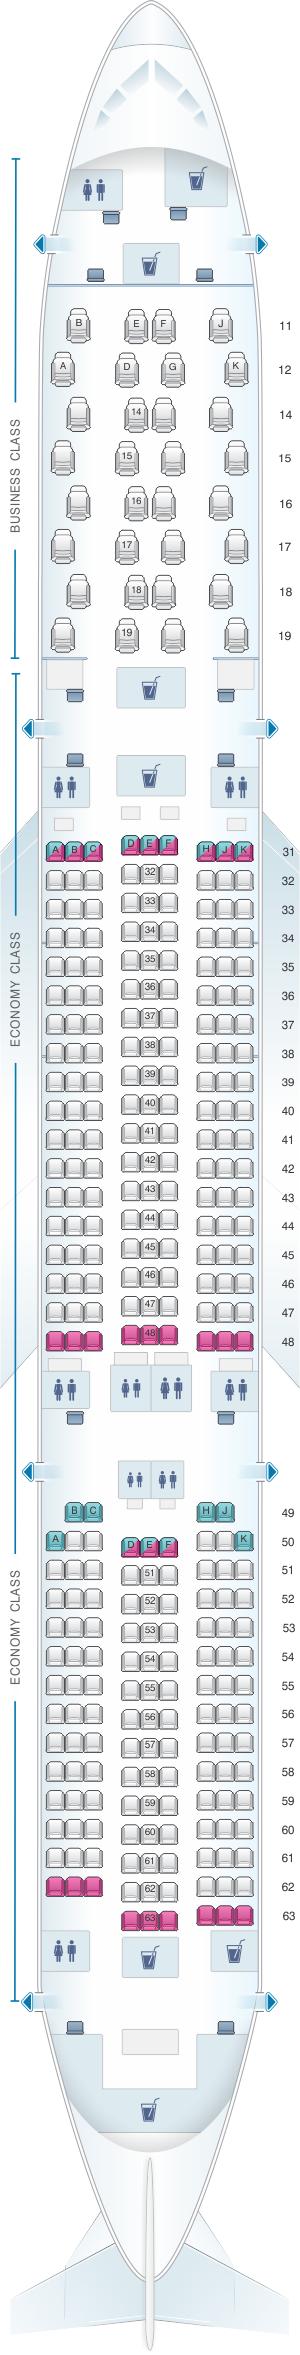 Seat map for Thai Airways International Airbus A350 900